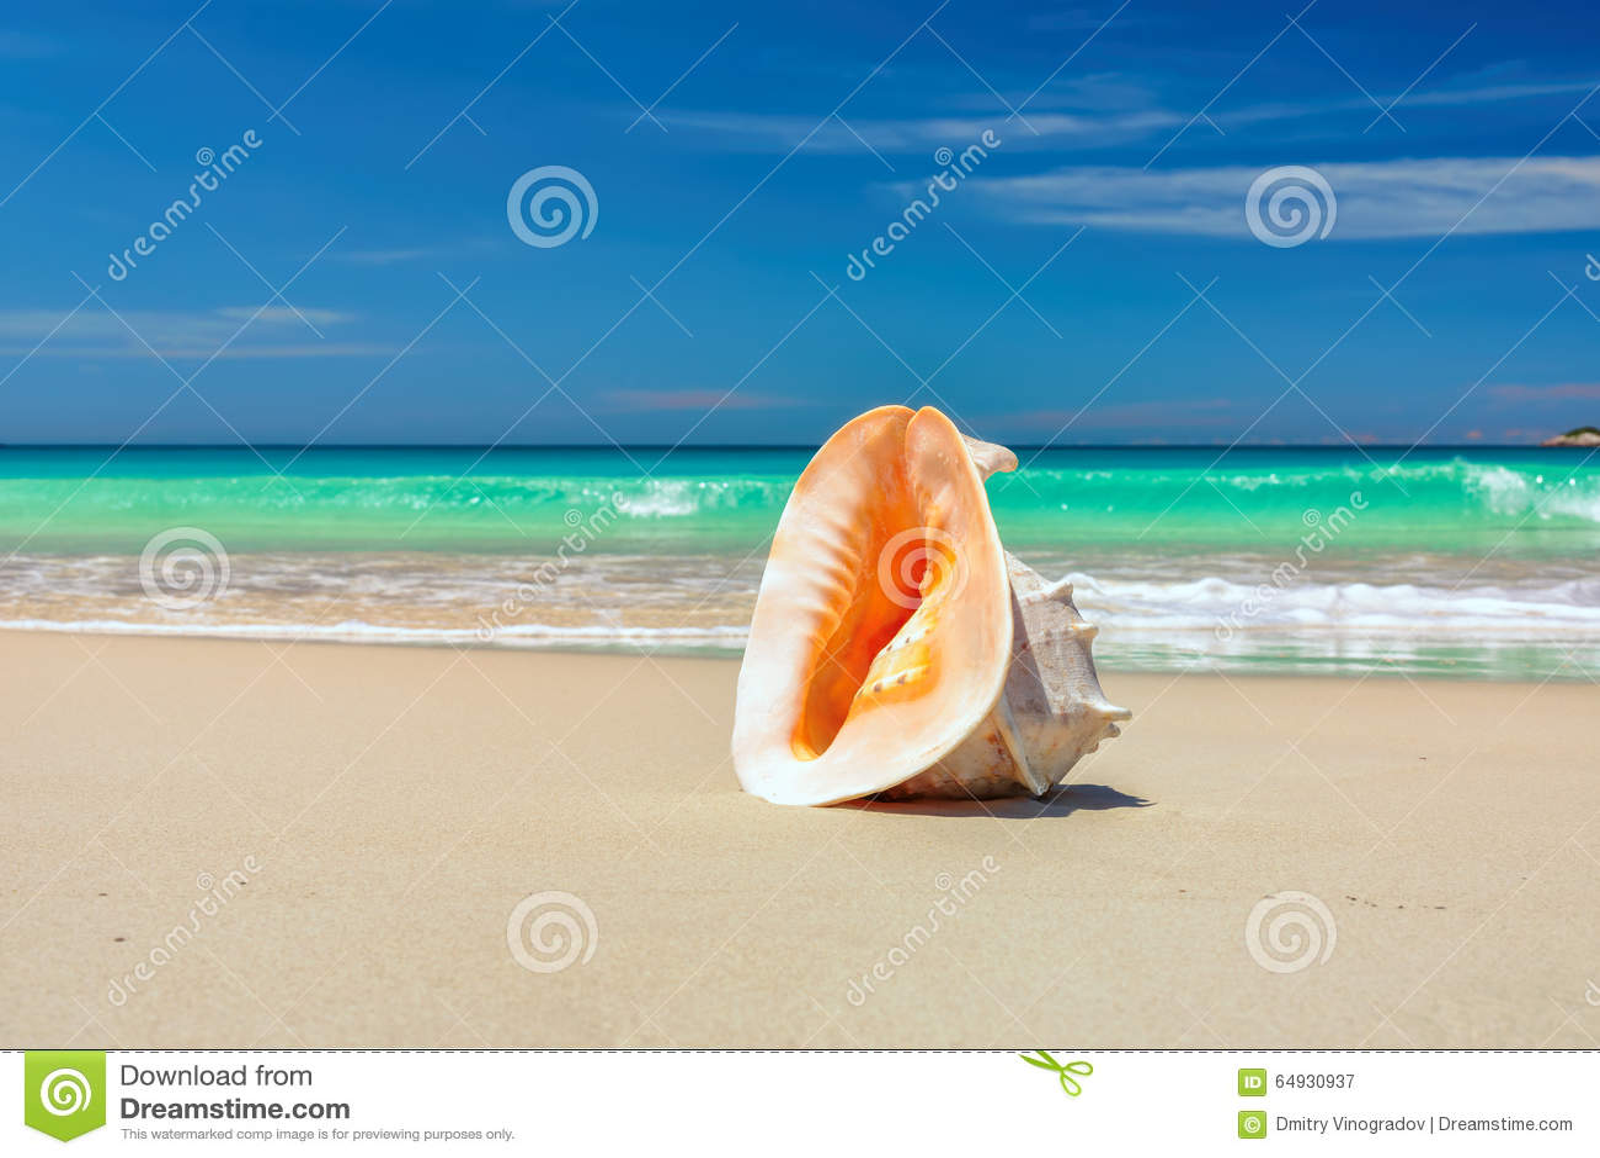 Раковина на пляже под золотым тропическим солнцем испускает лучи